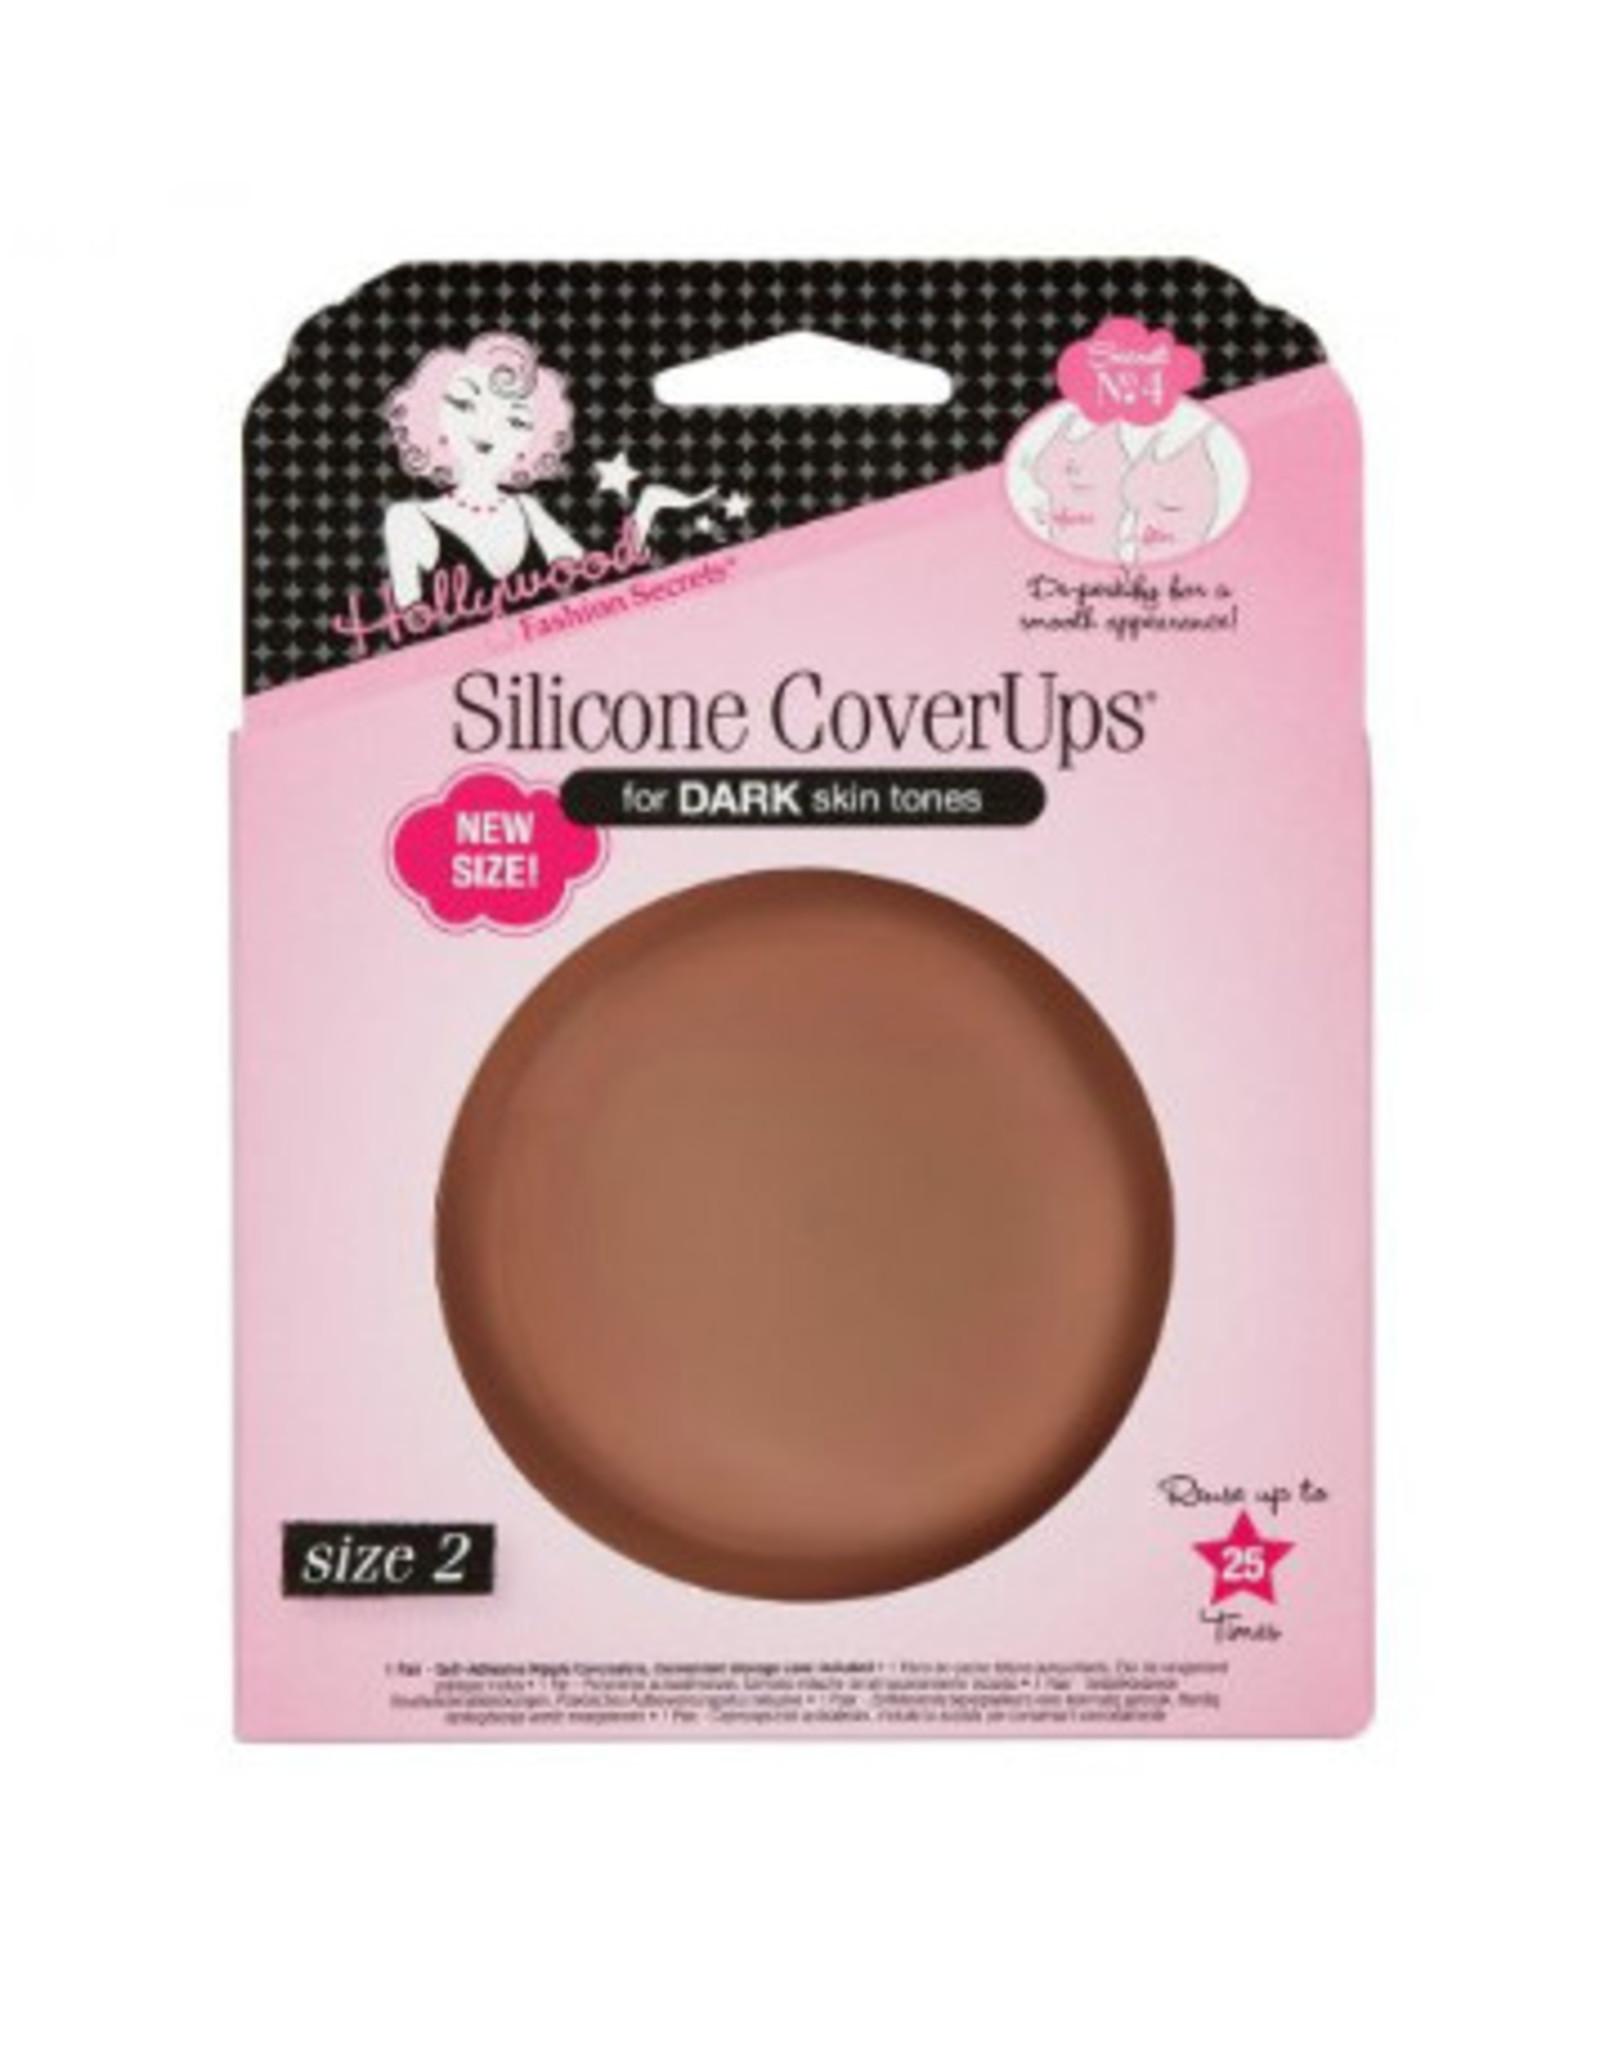 SILICONE COVER UPS